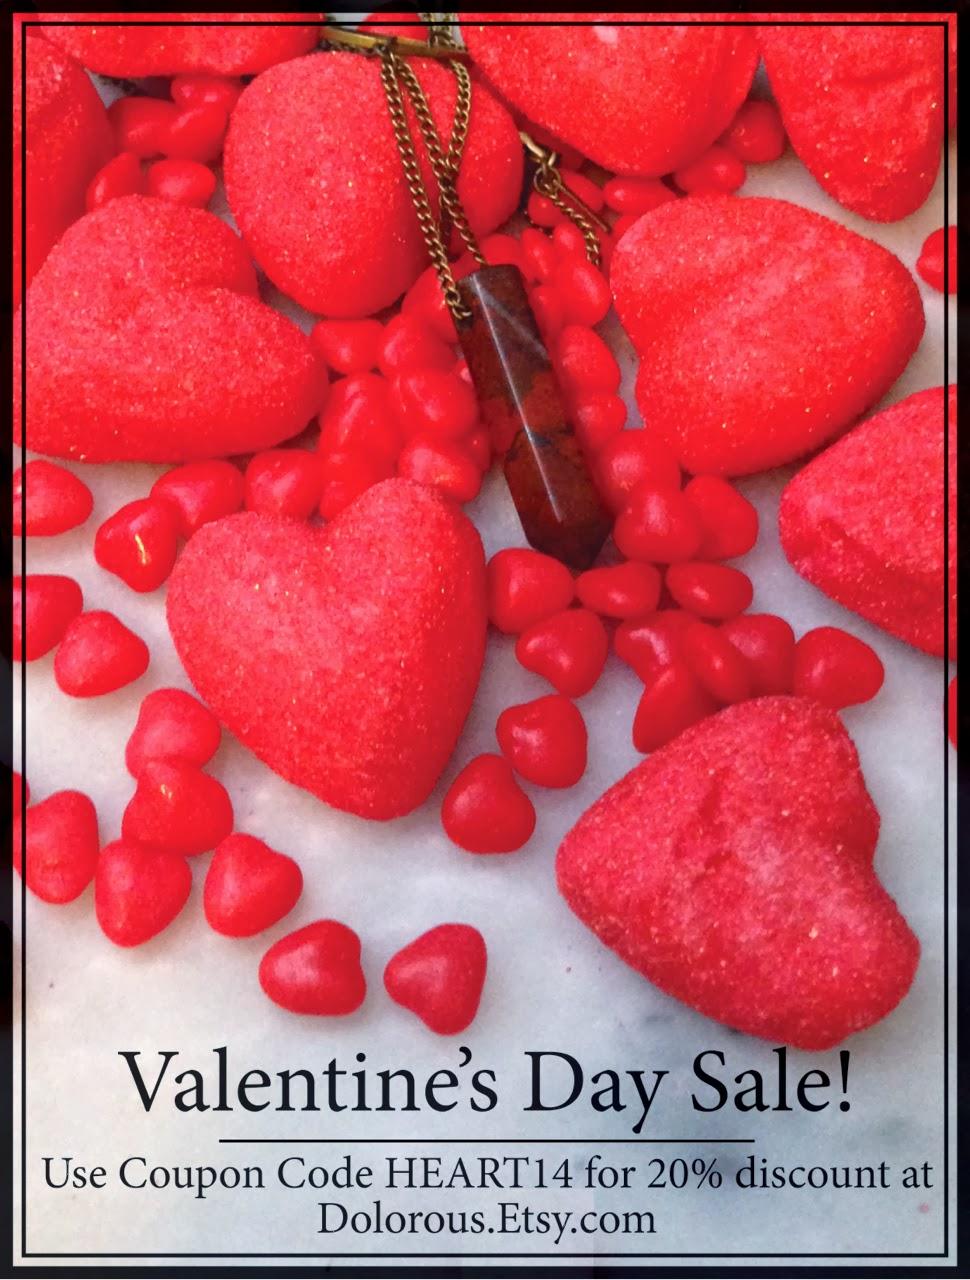 dolorous jewelry valentines day etsy sale - Valentine Day Jewelry Sales